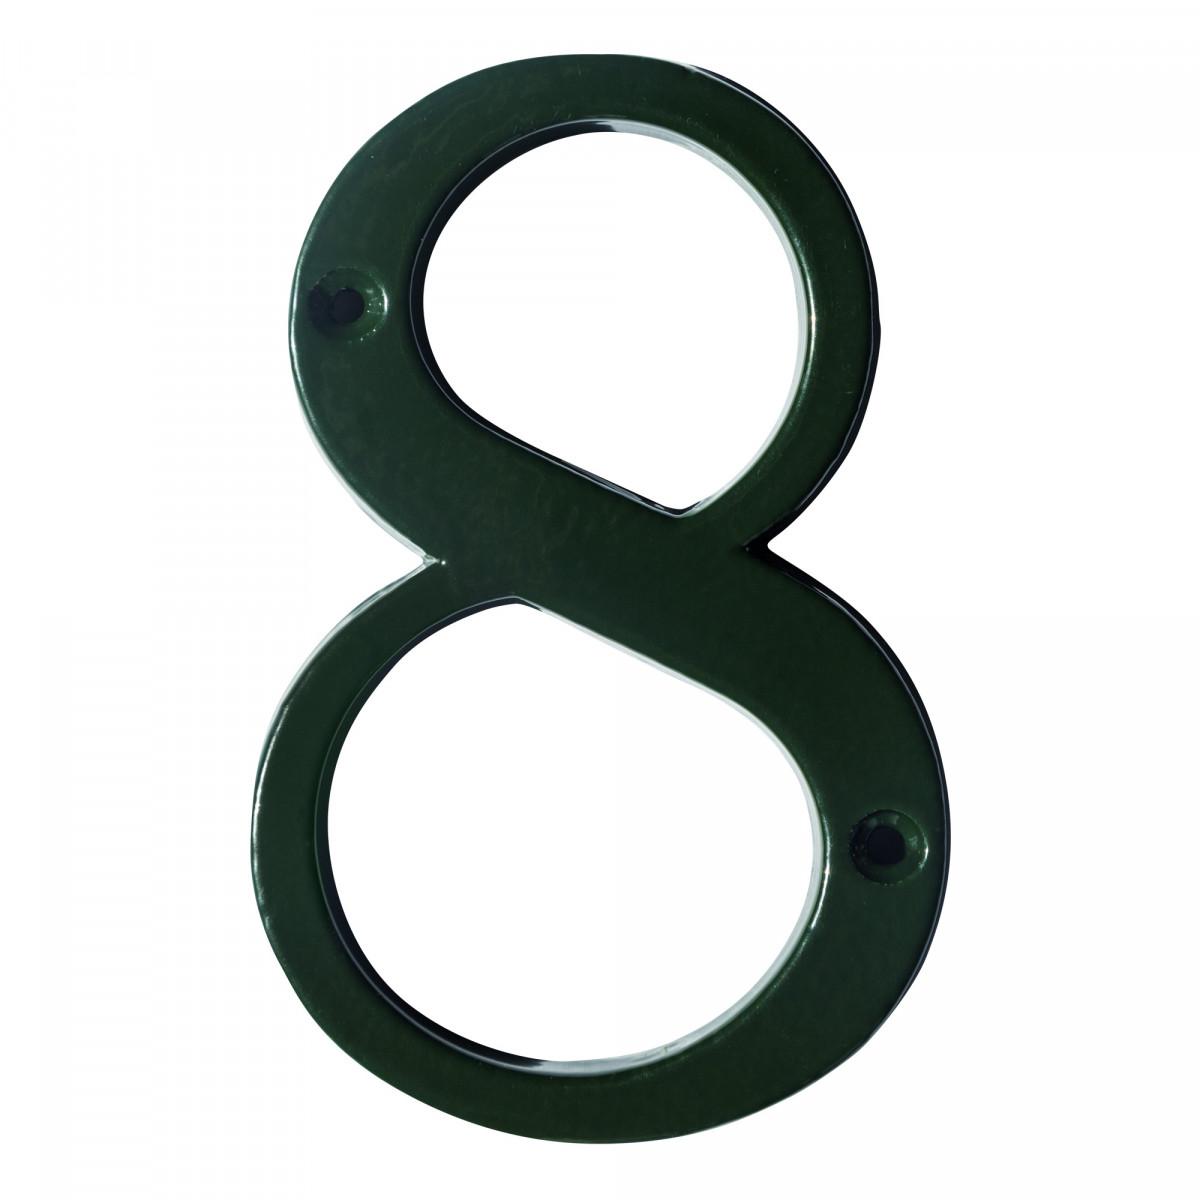 Huisnummer 8 (5858) - KS Verlichting - Huisnummers